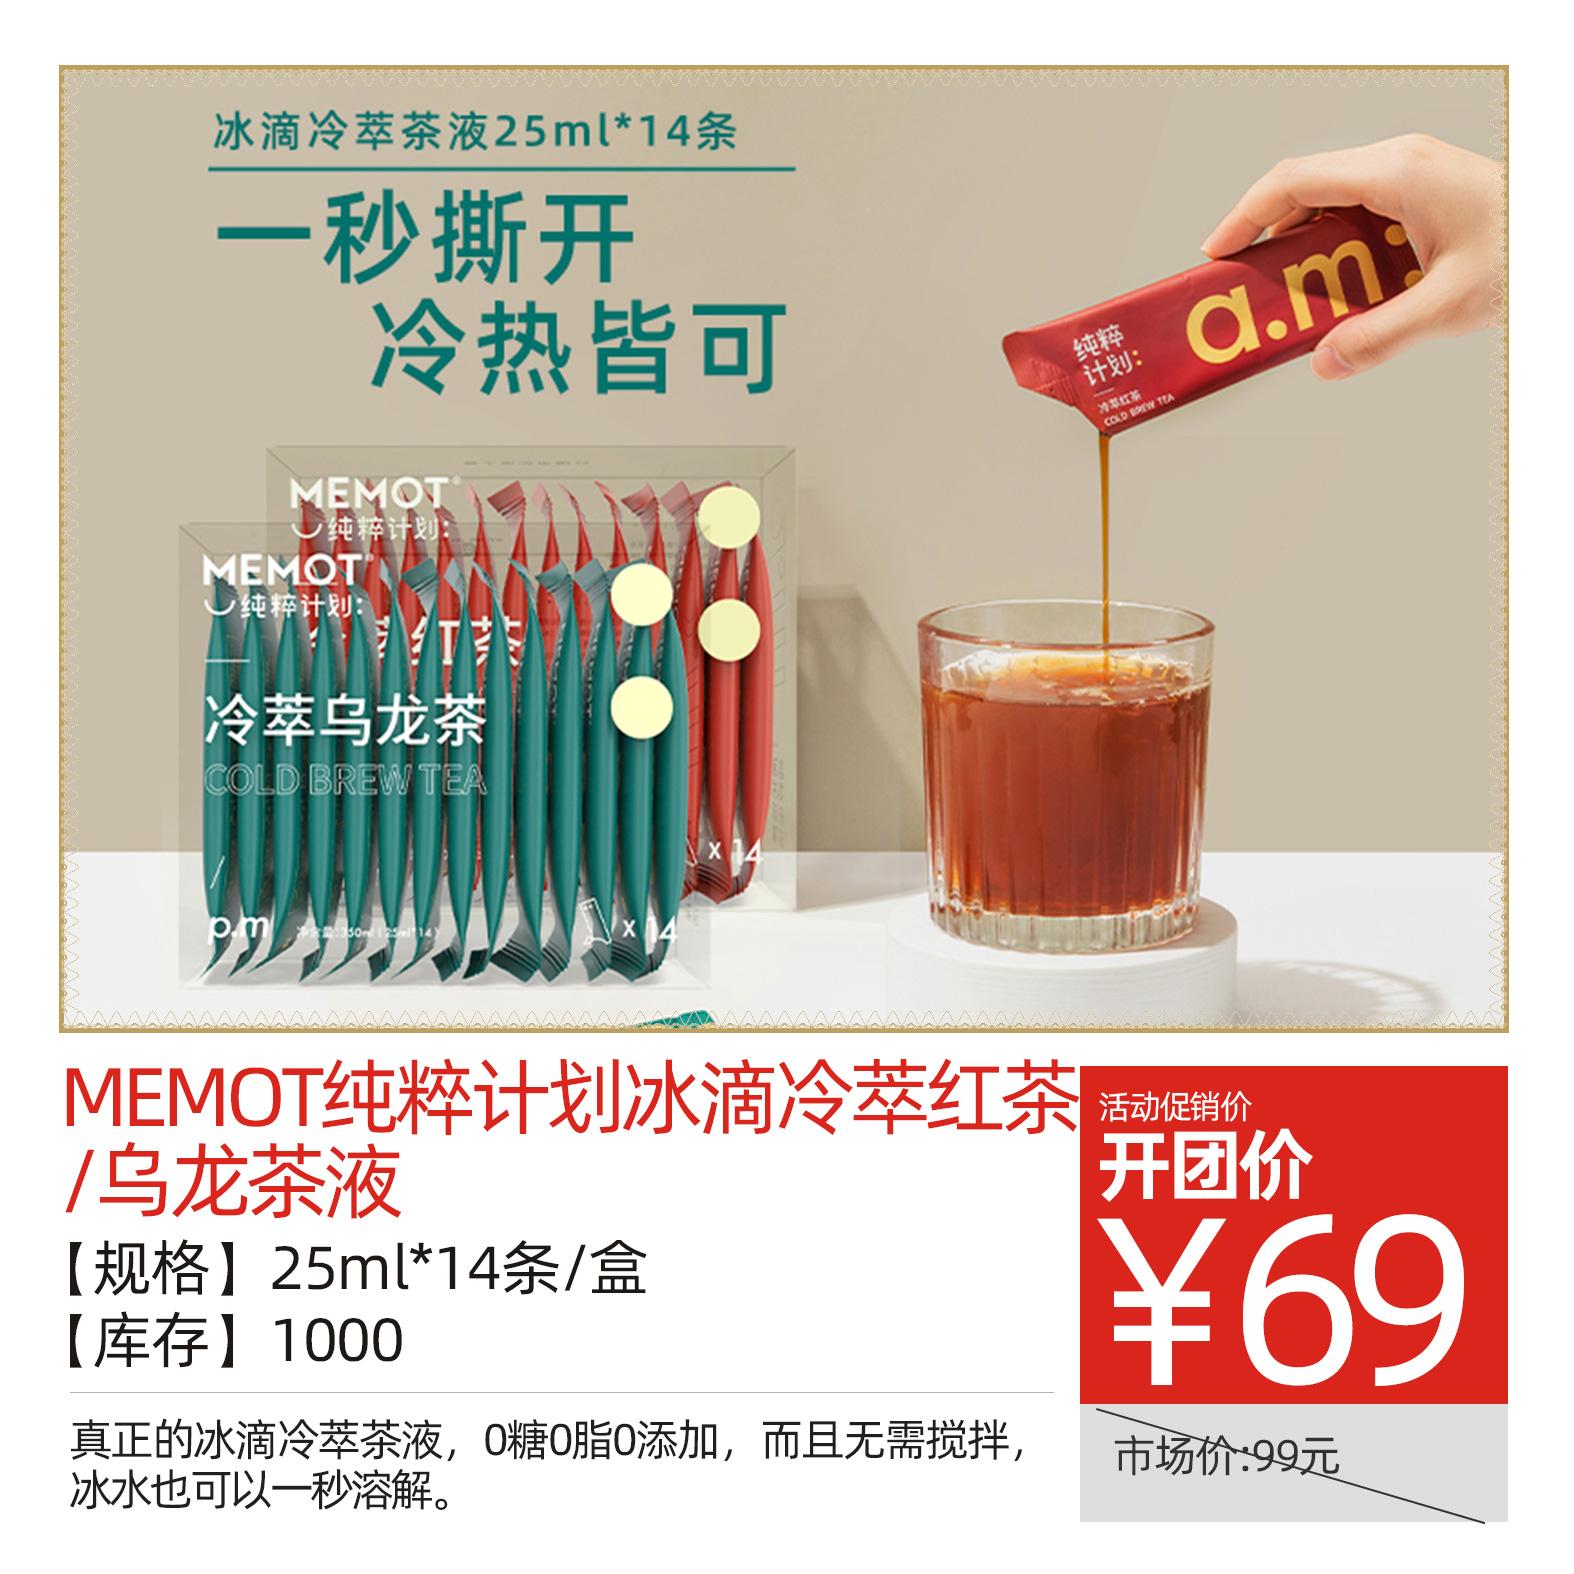 memot纯粹计划冰滴冷萃红茶/乌龙茶液